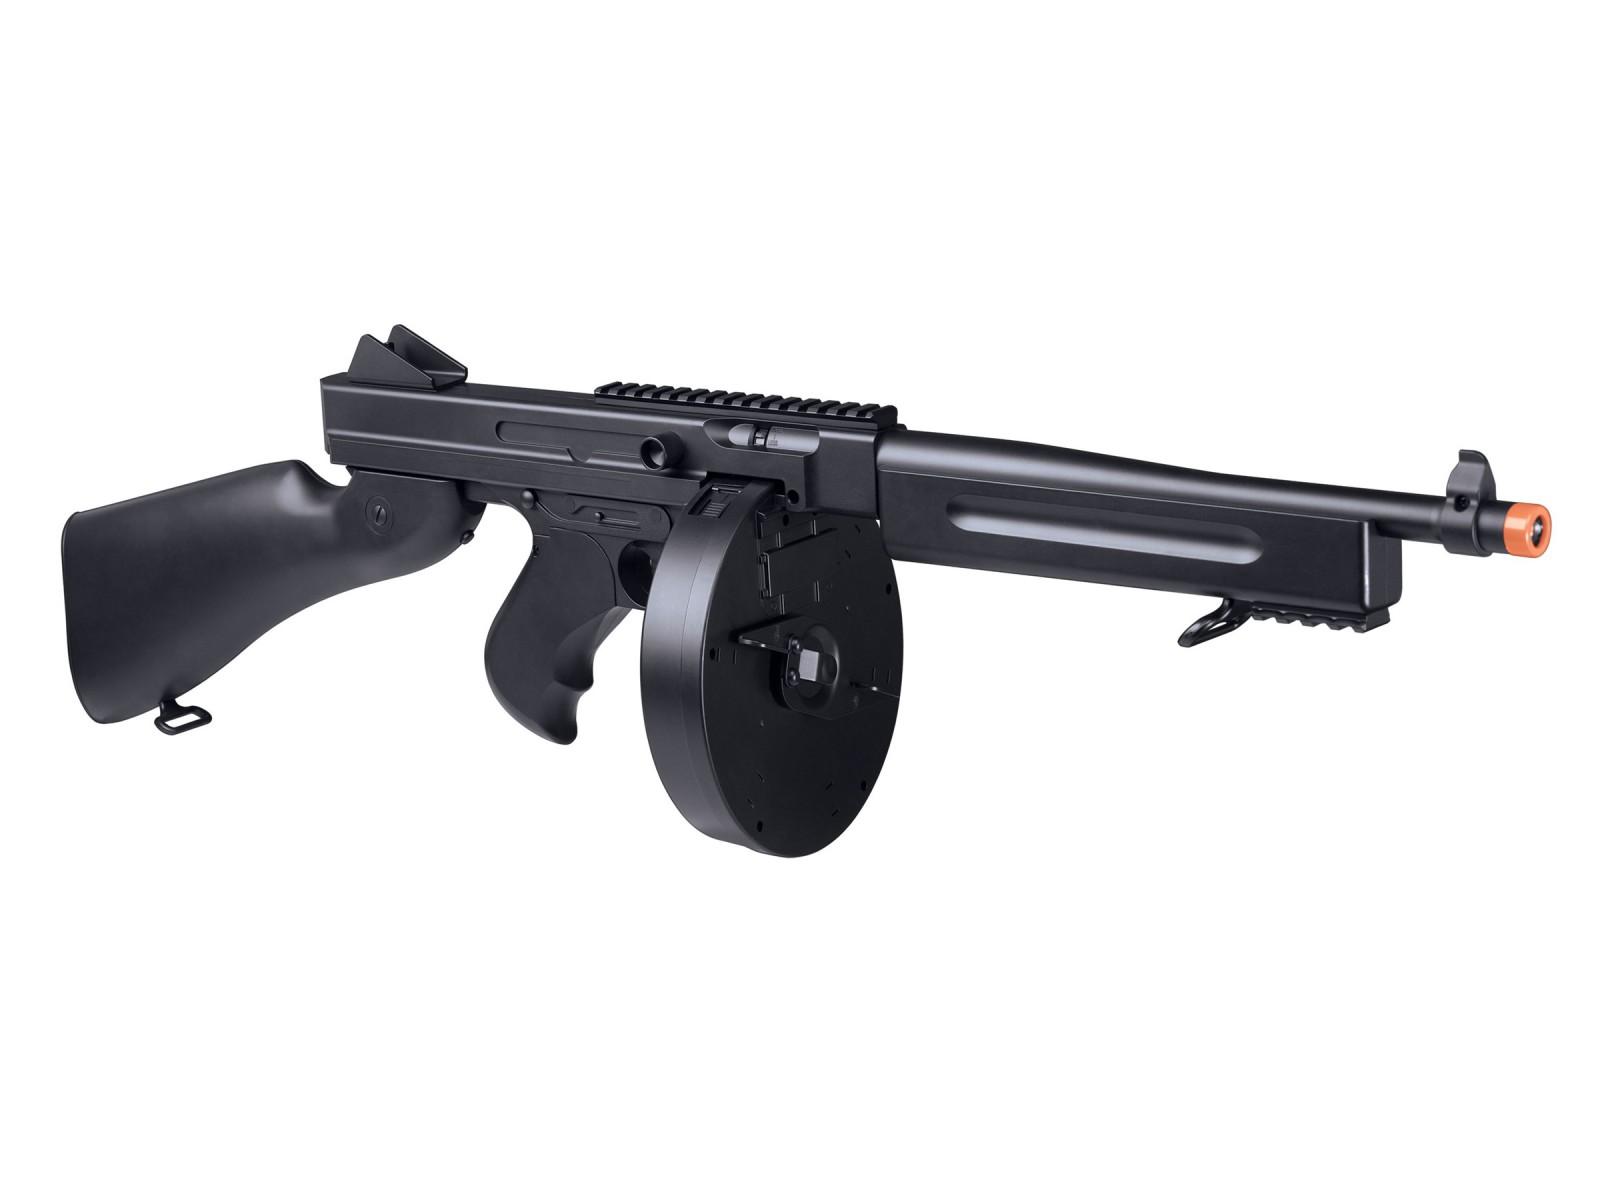 Game_Face_GFSMG_Electric_Airsoft_Submachine_Gun_6mm